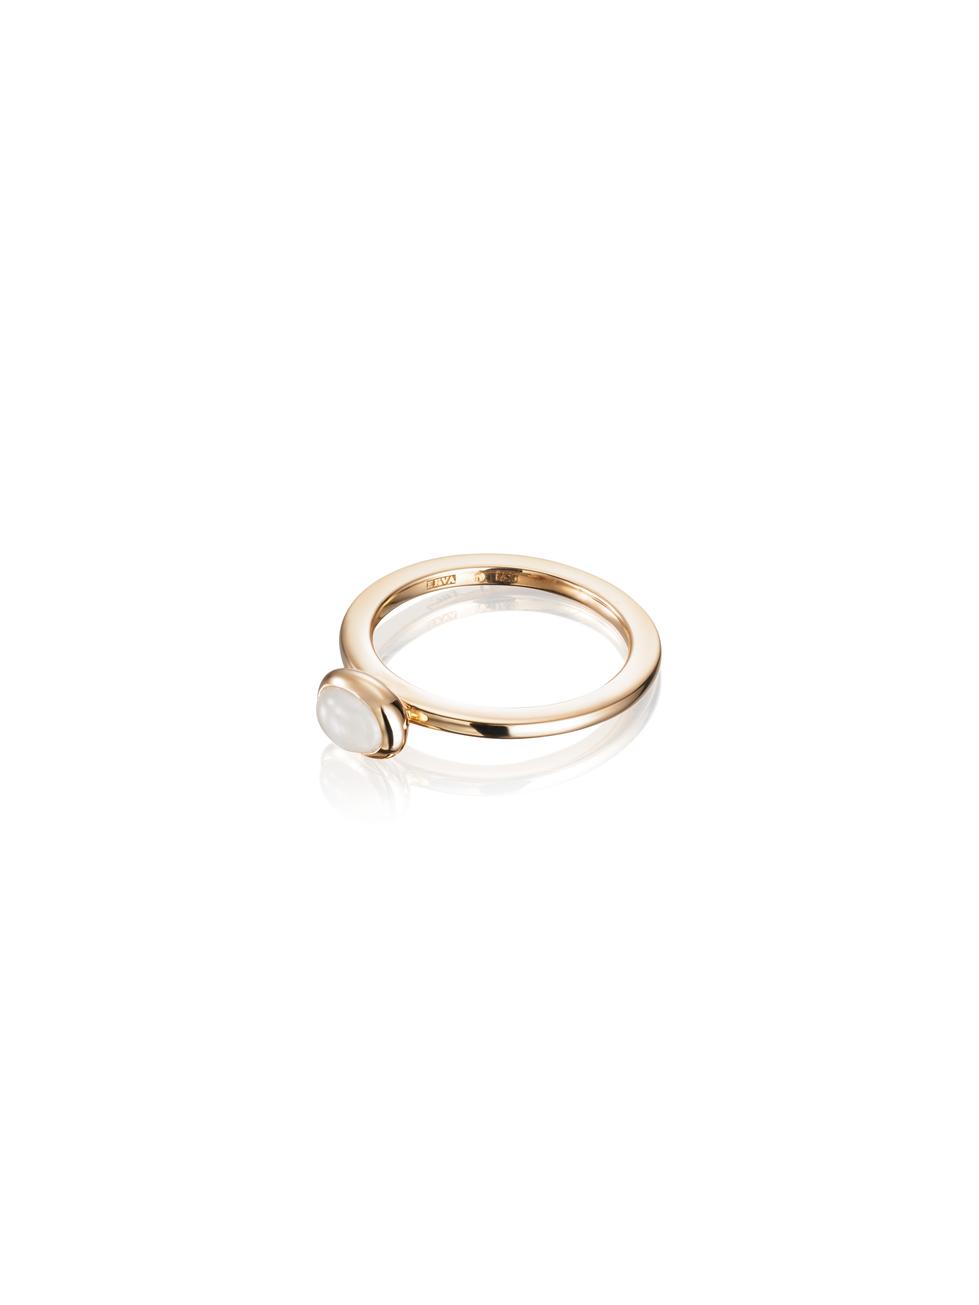 Love Bead Ring Moonstone 13-101-01448(2).jpg